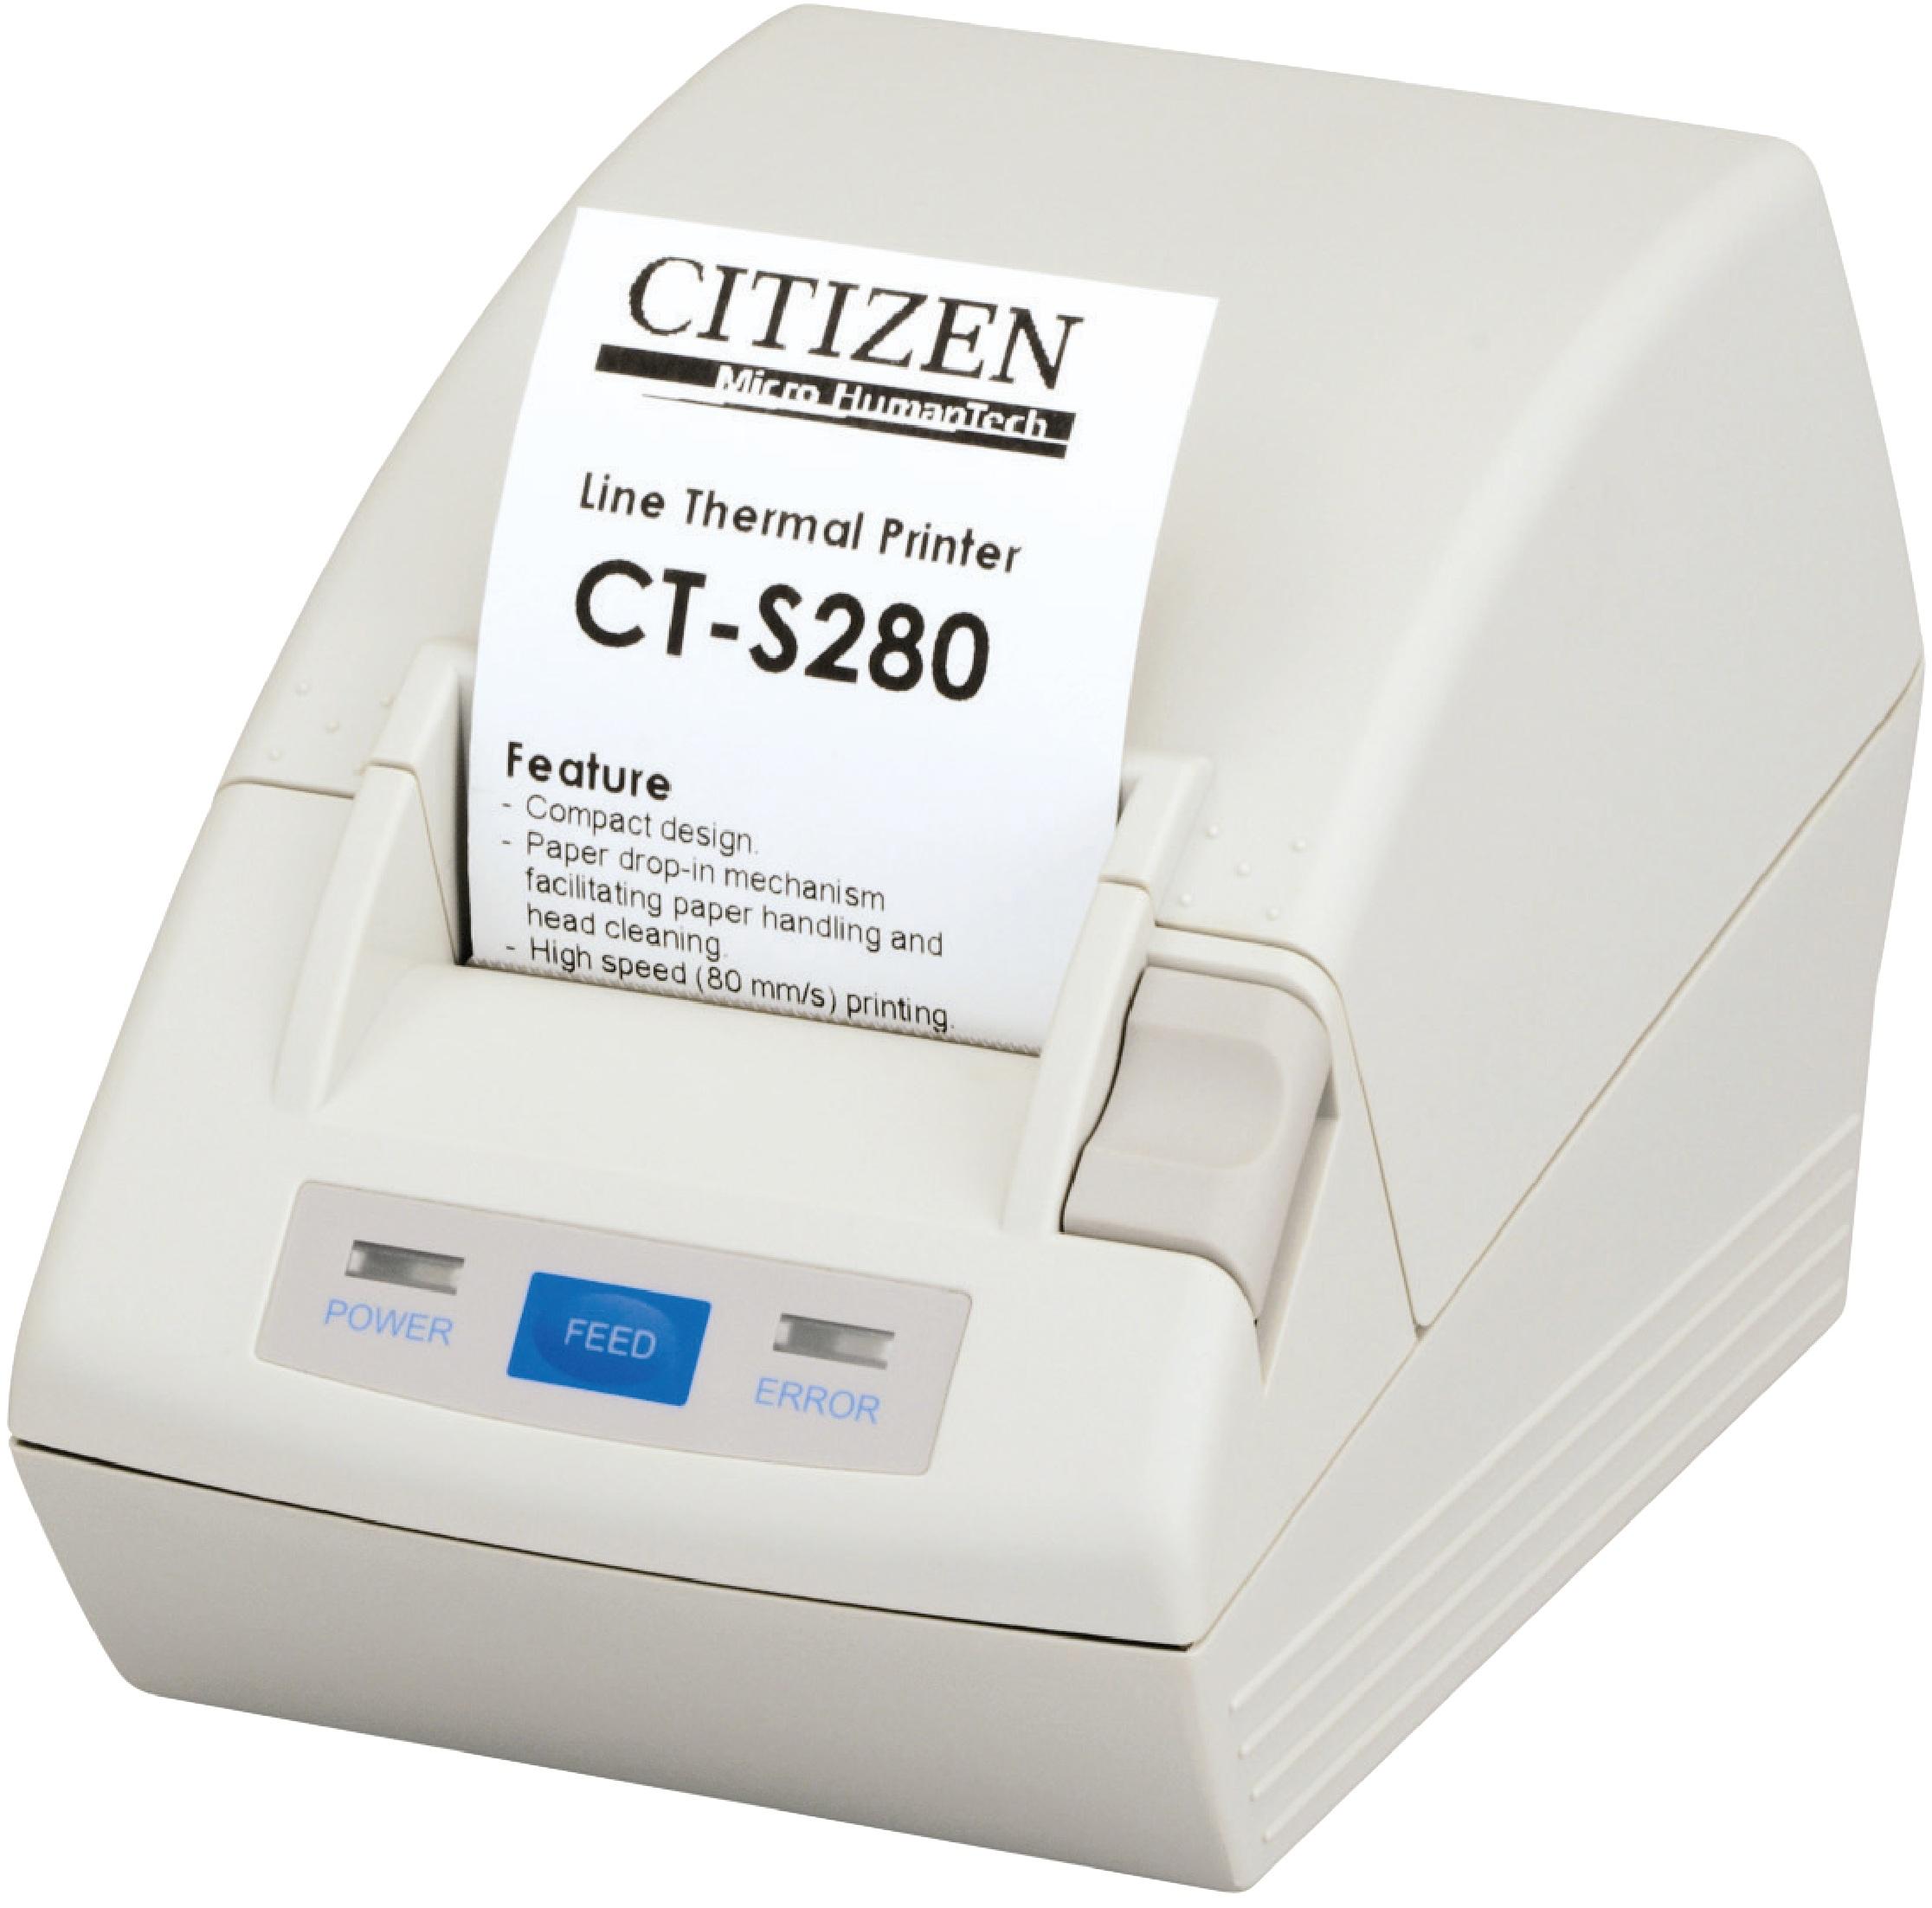 Citizen CT-S280 Direkt Wärme POS printer 203 x 203 DPI